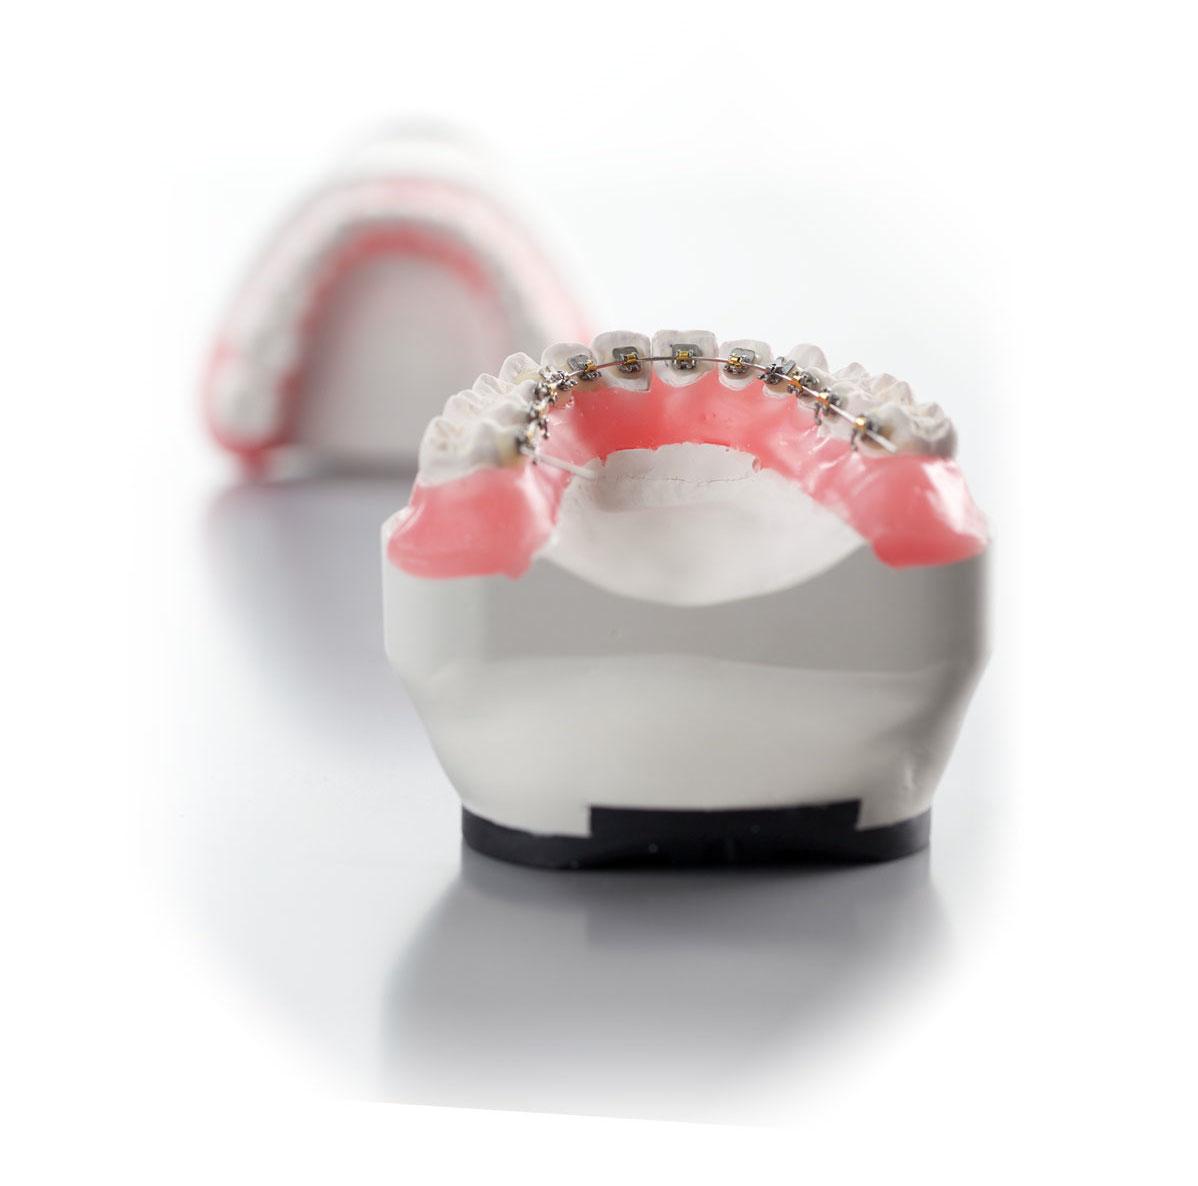 lingual-braces-cardiff